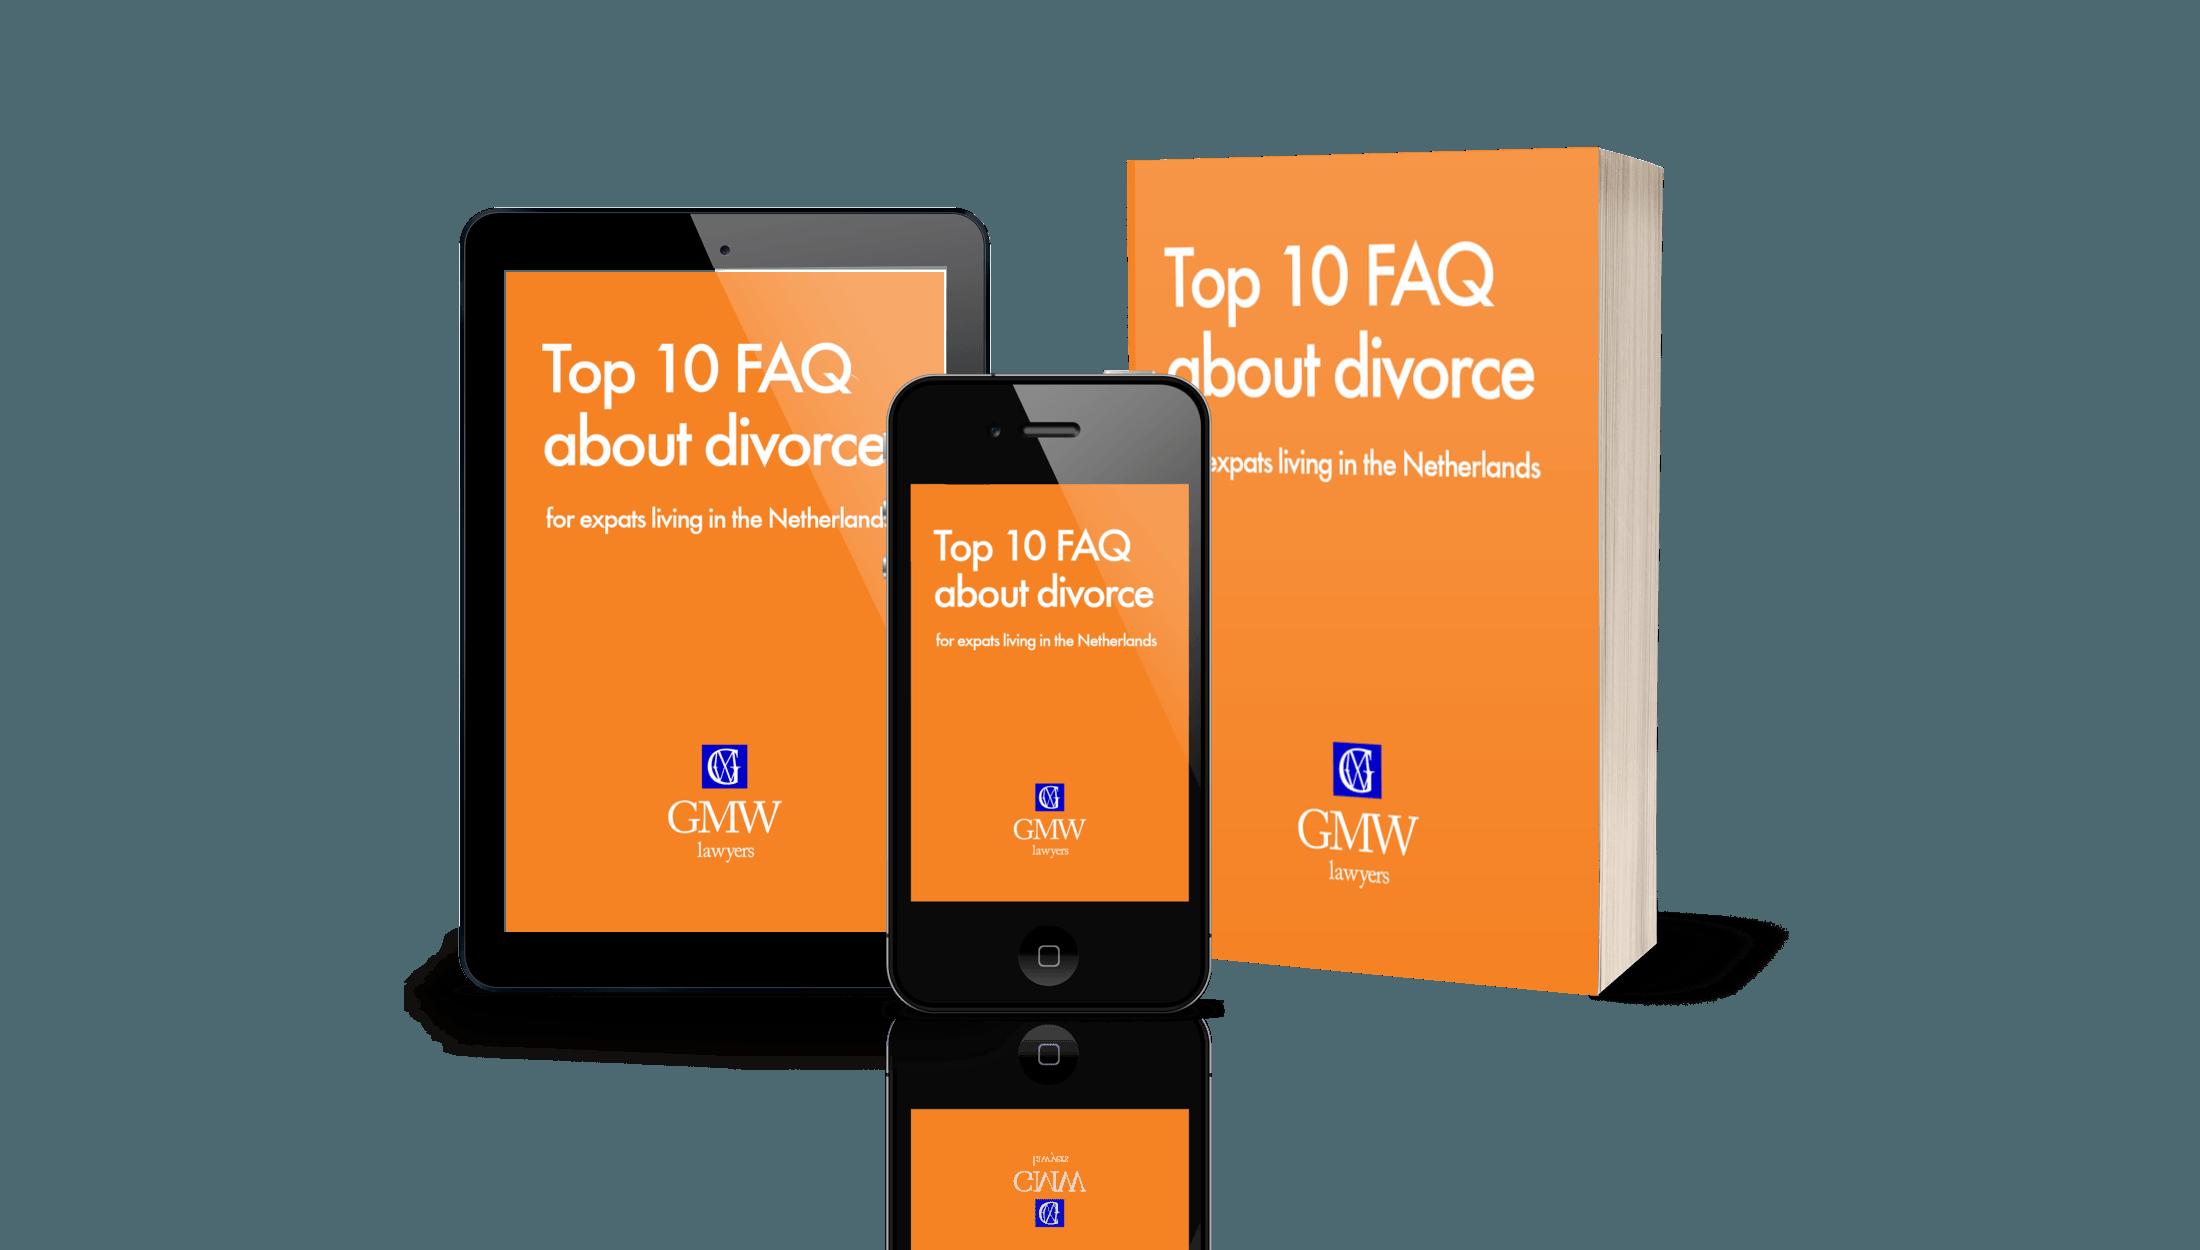 Top 10 FAQ about divorce white paper